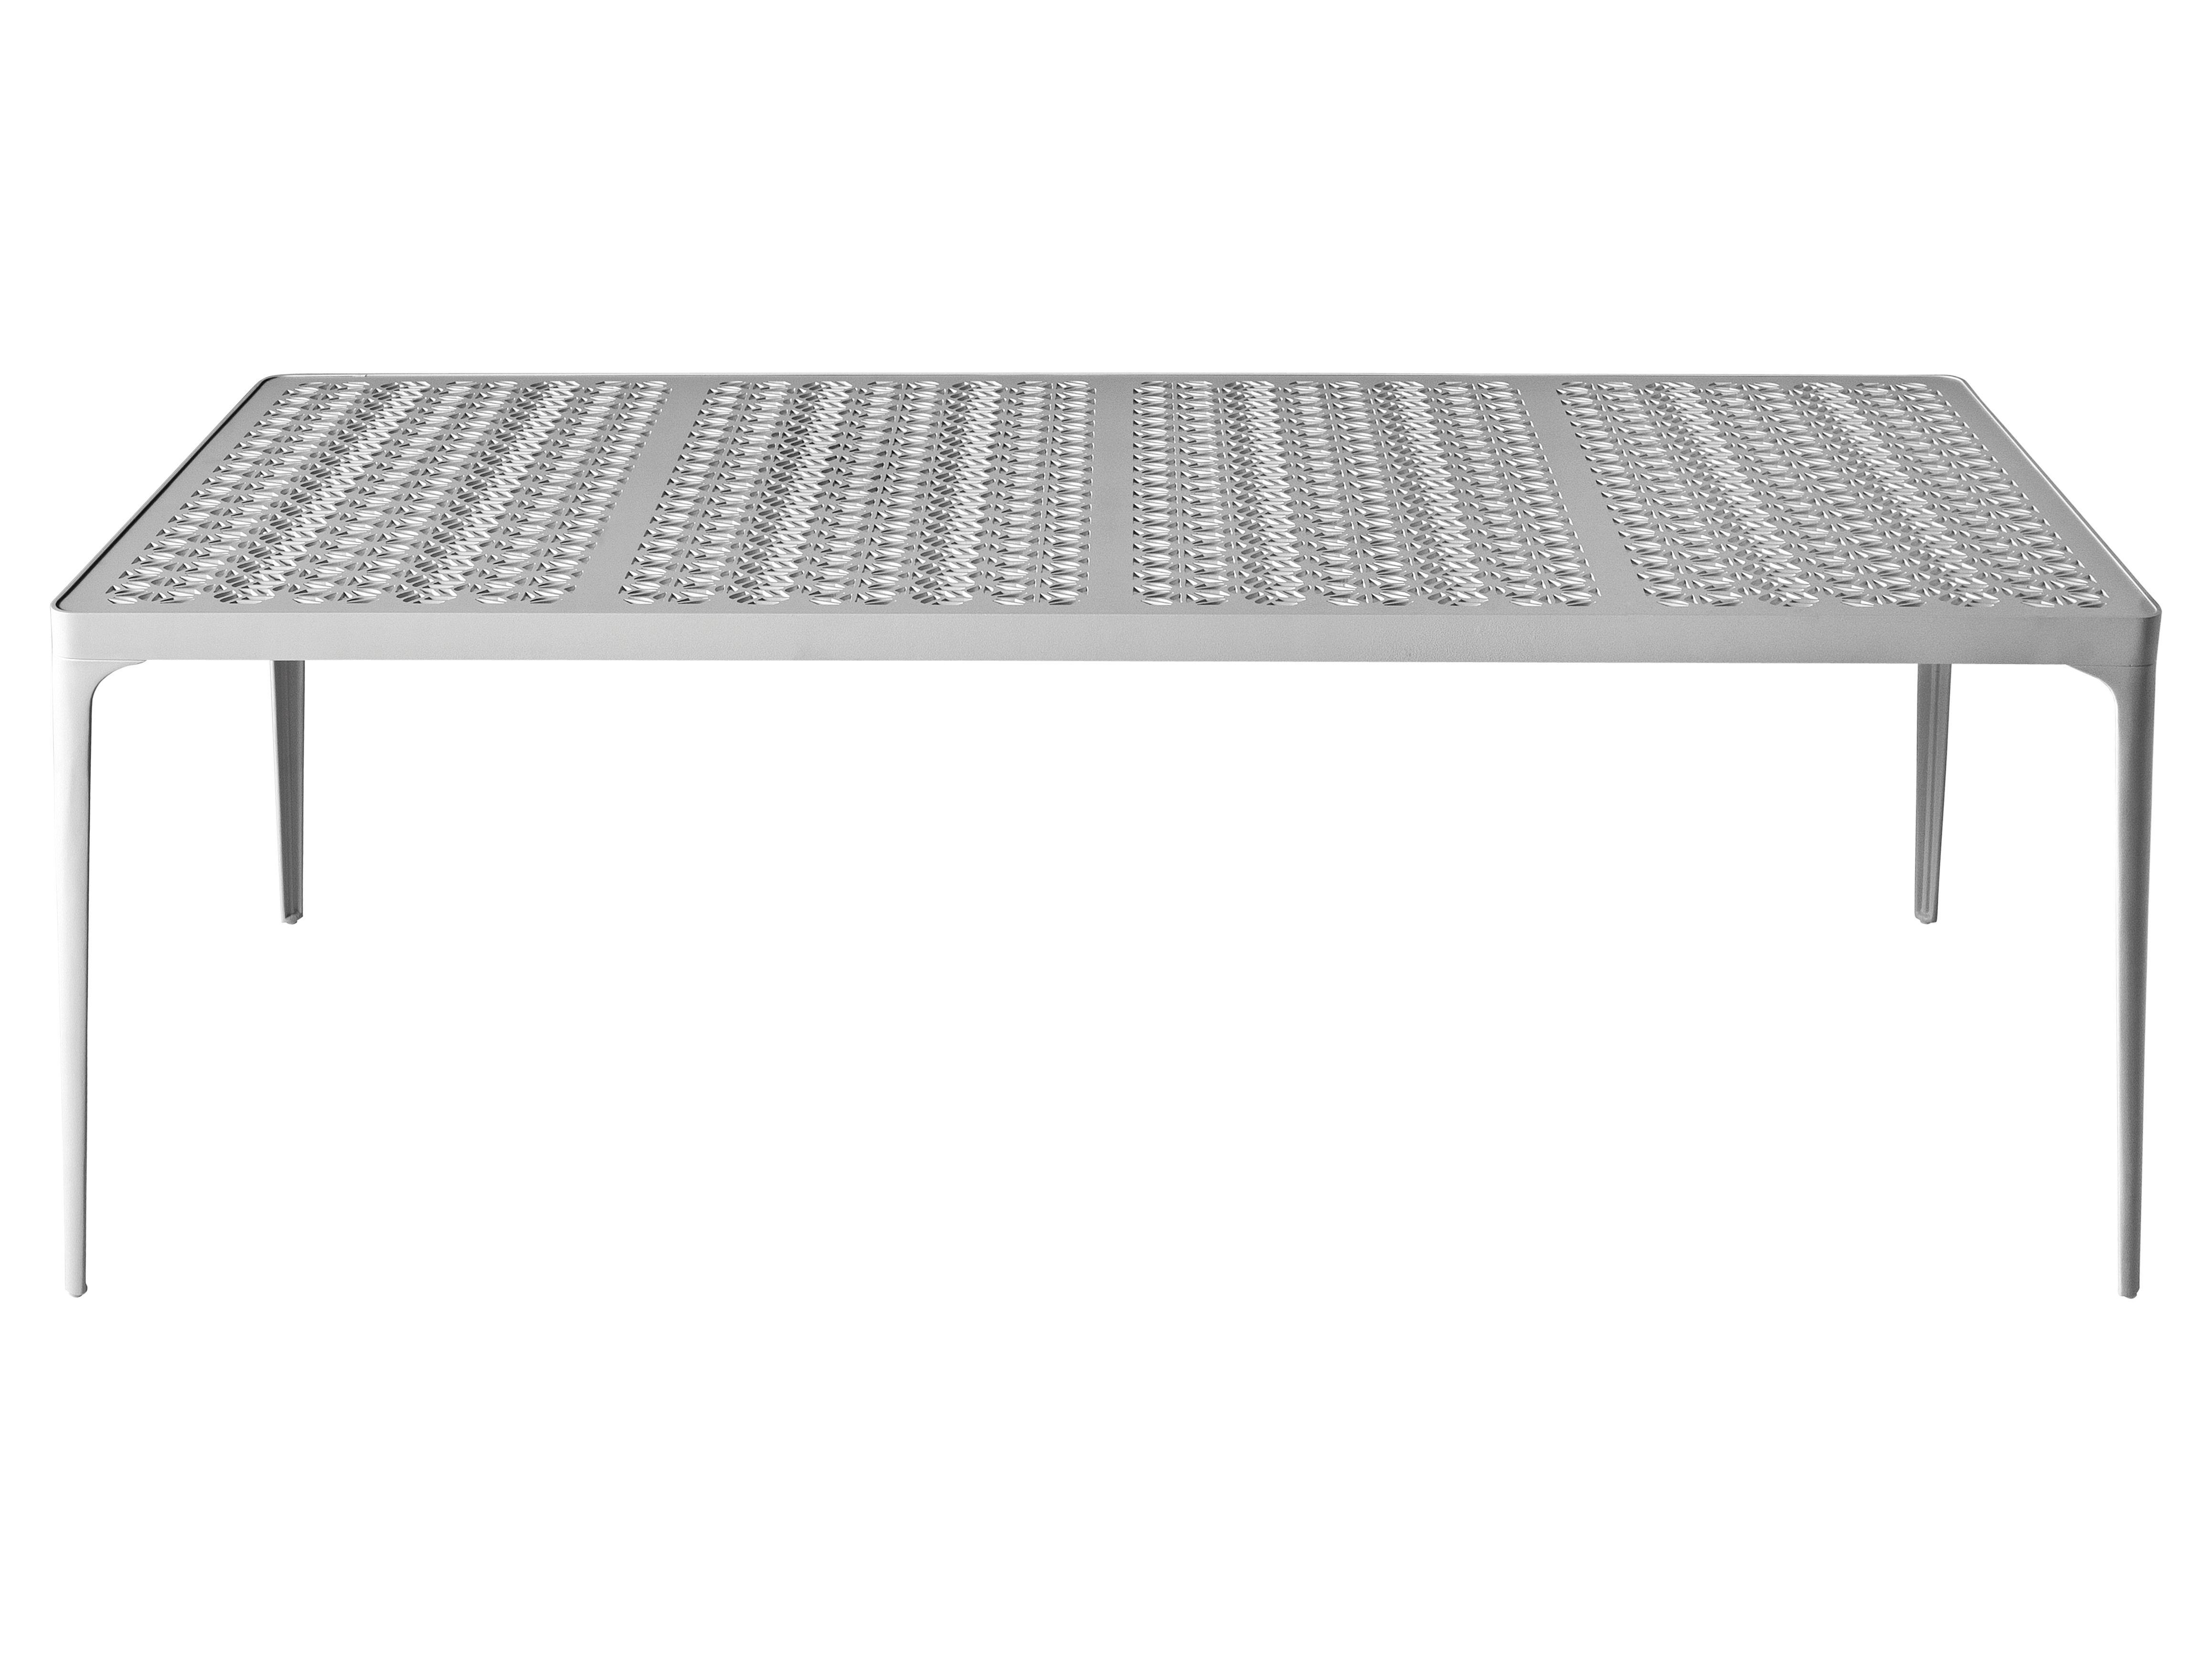 sunrise table 200 x 80 cm white 200 x 80 cm by driade. Black Bedroom Furniture Sets. Home Design Ideas